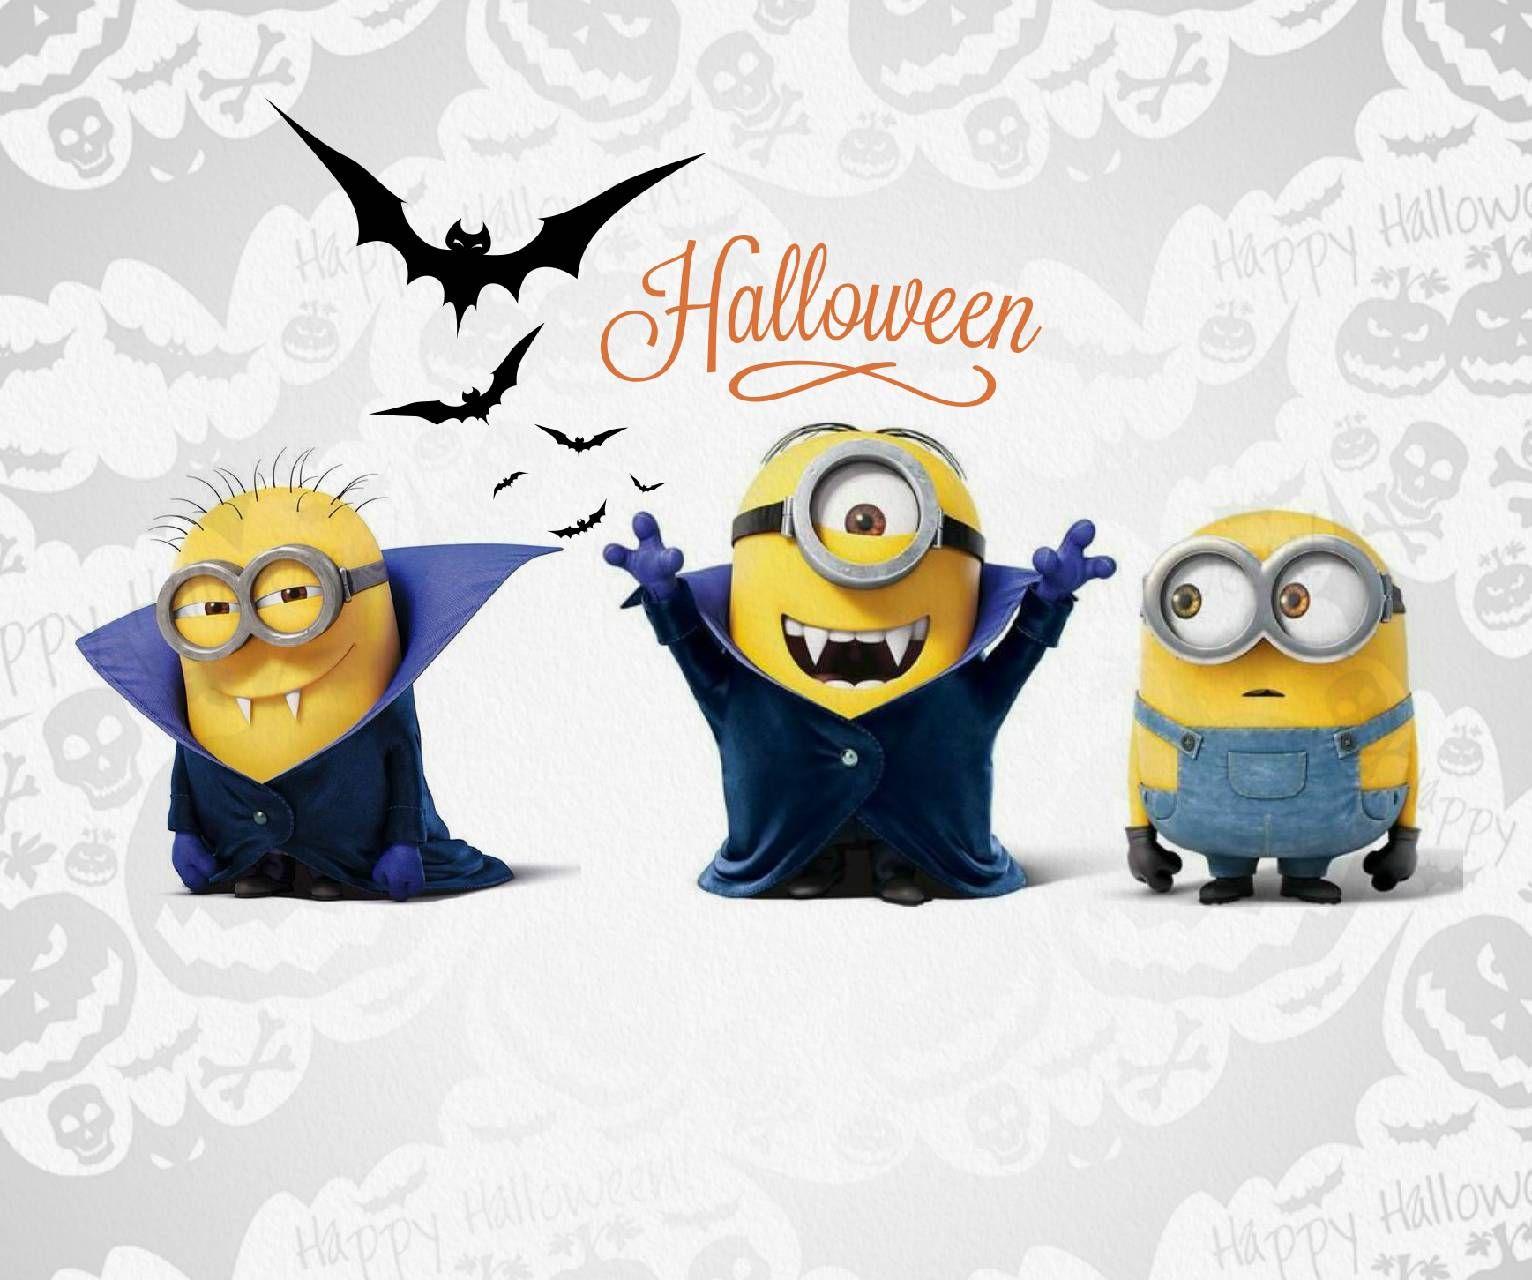 Download Halloween Minions Wallpaper By Agaaa K B3 Free On